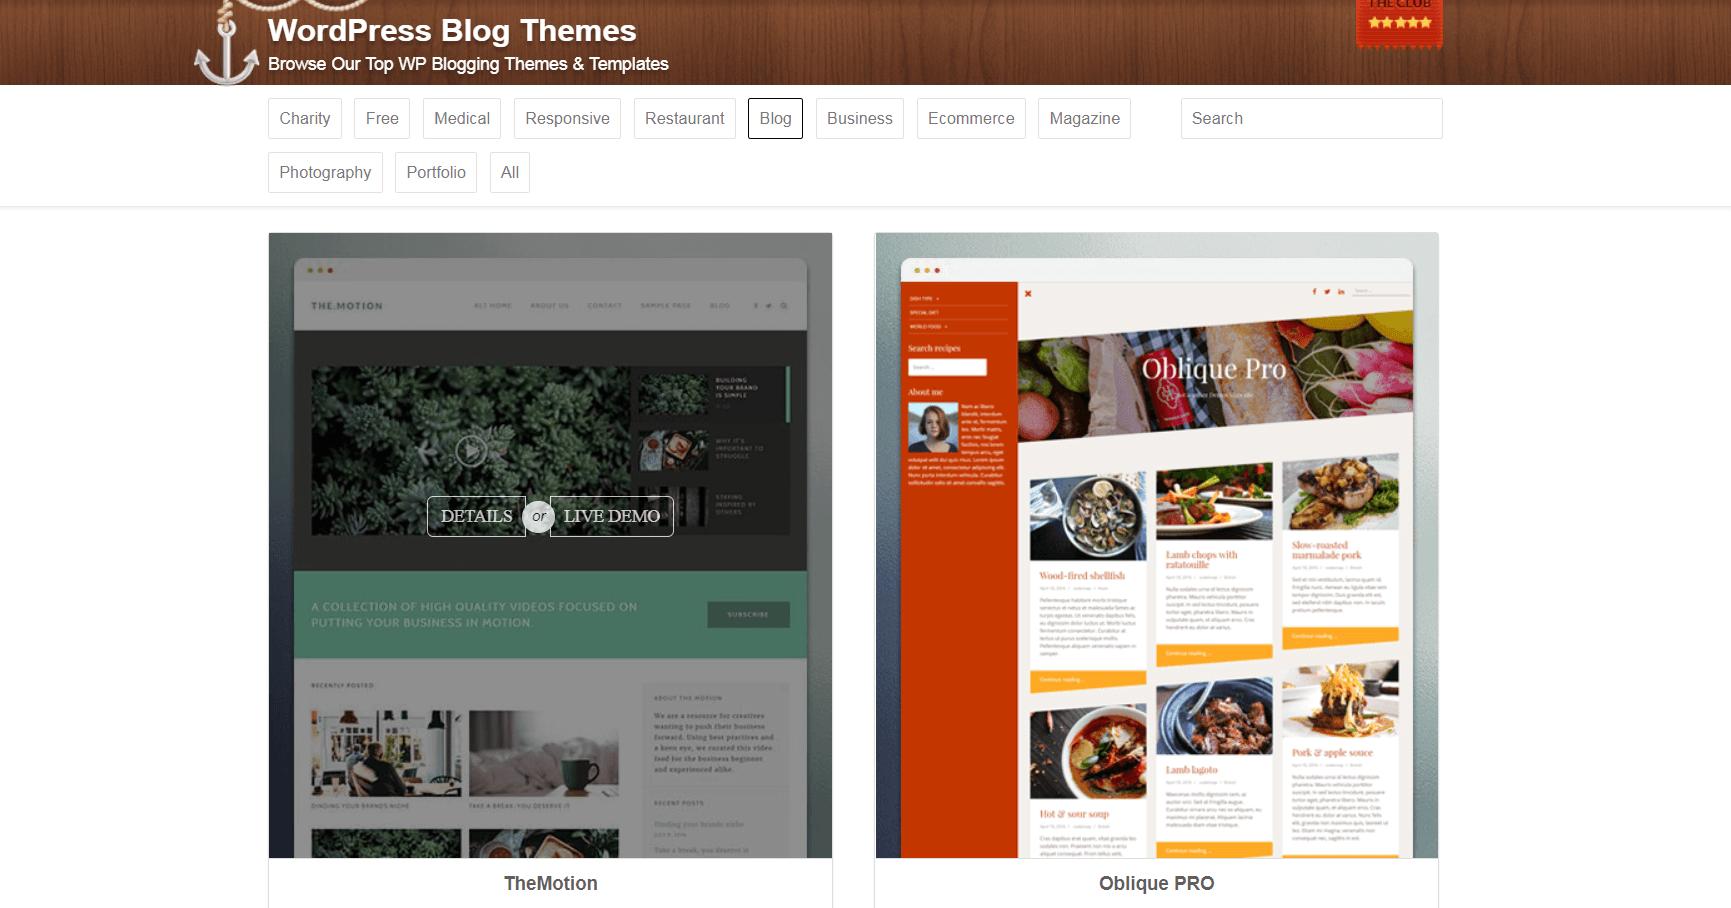 Temas de blog en ThemeIsle.